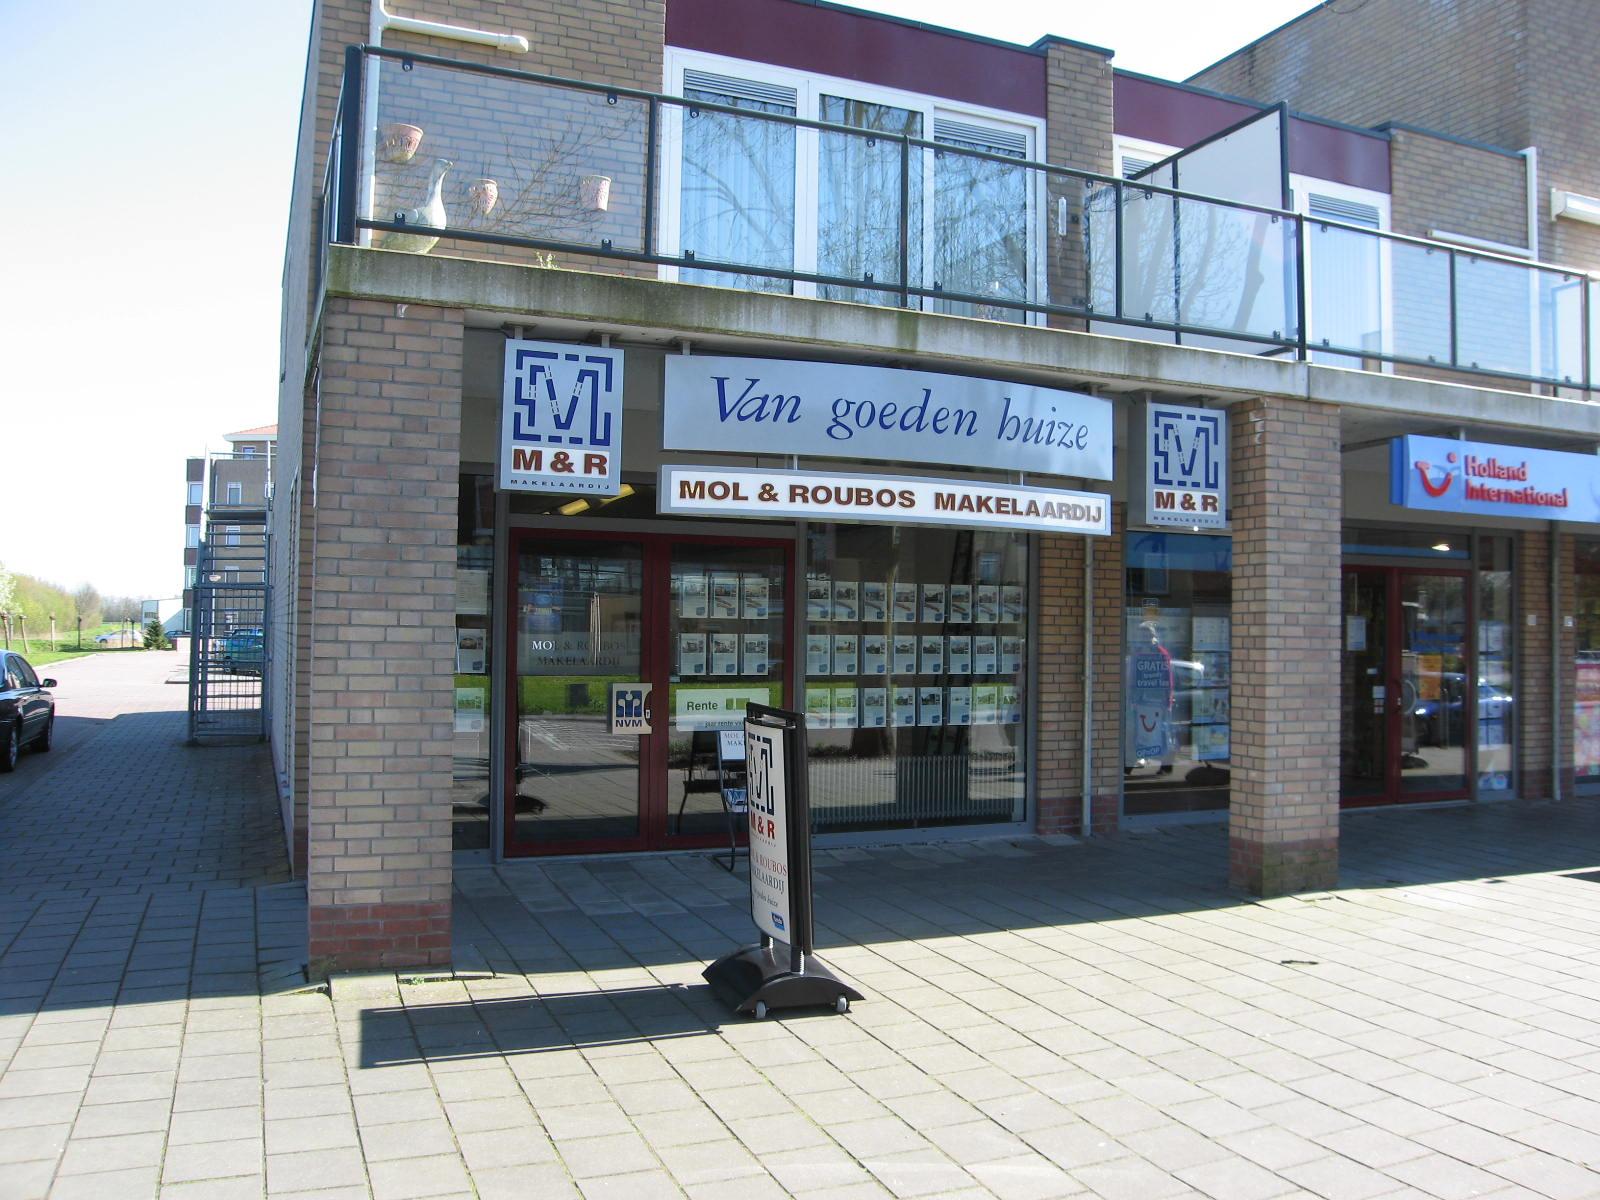 Kantoor Vestiging MOL & ROUBOS MAKELAARDIJ (Woudrichem)